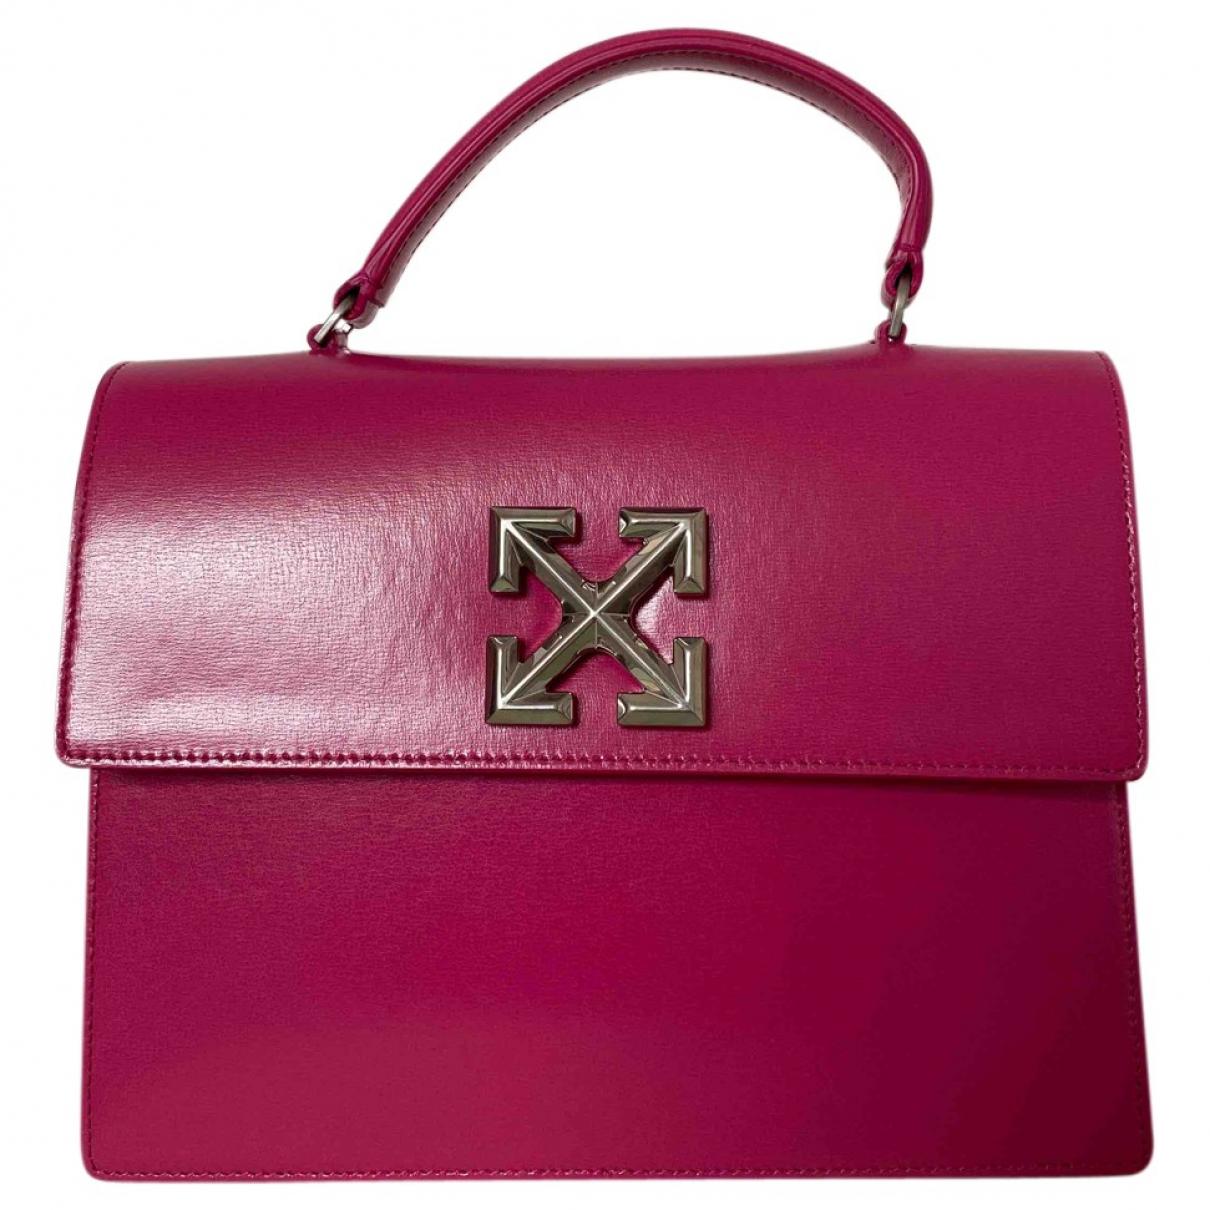 Off-white \N Pink Leather handbag for Women \N